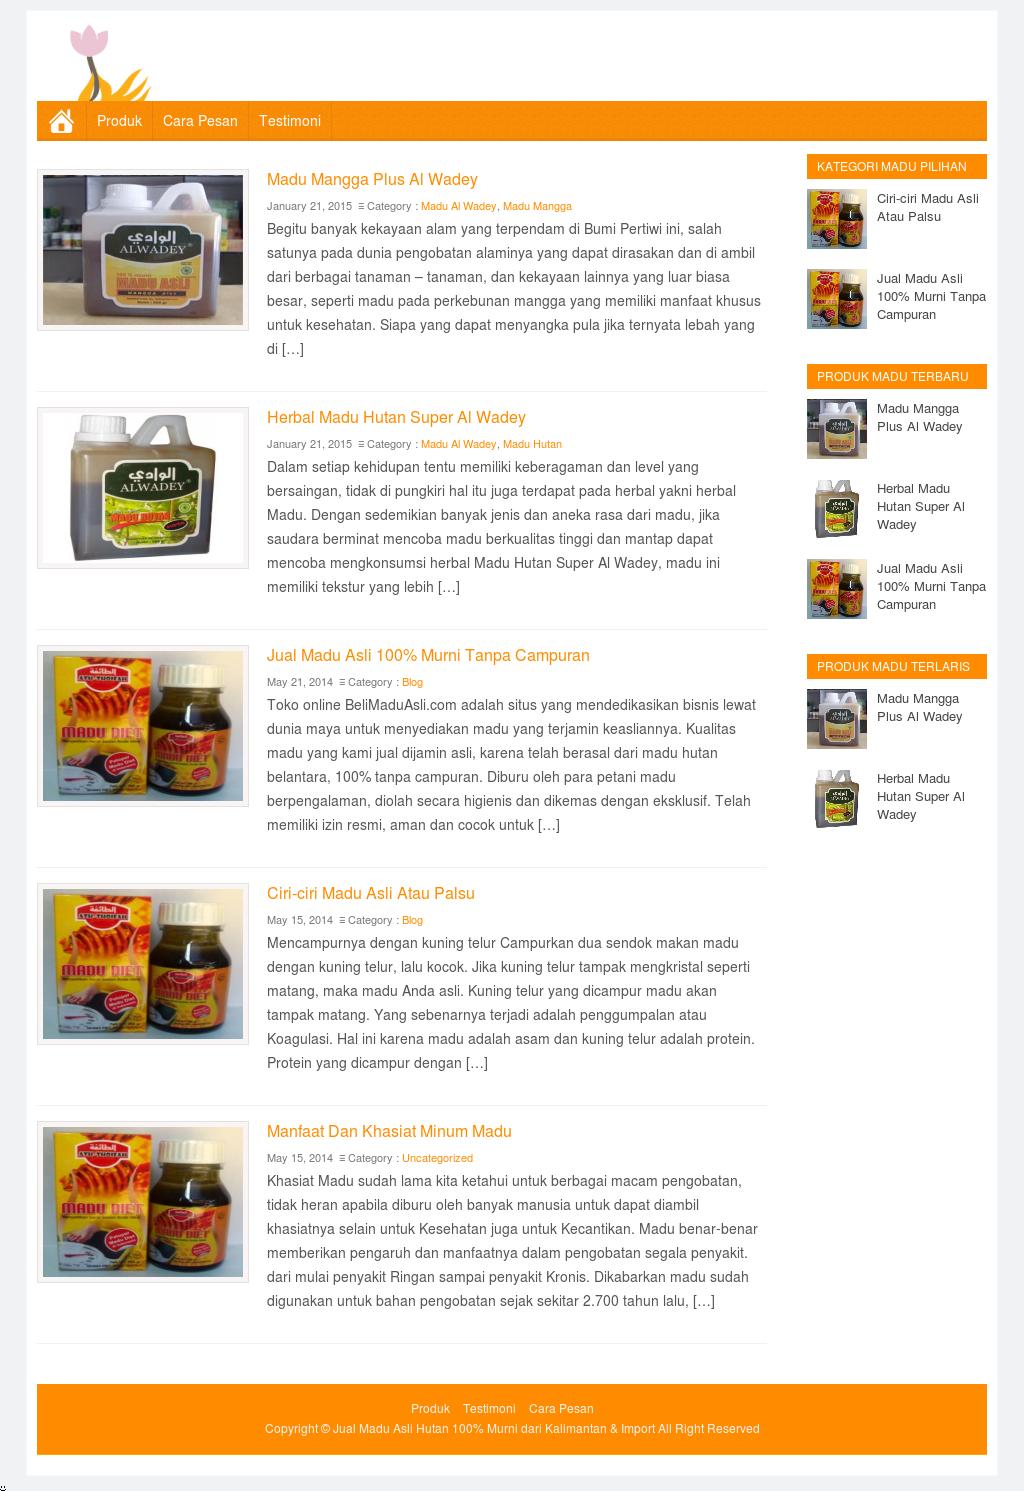 Pengen Kurus Gak Pake Lama Tapi Aman Alami Minum Madu Diet Ajaah Competitors Revenue And Employees Owler Company Profile